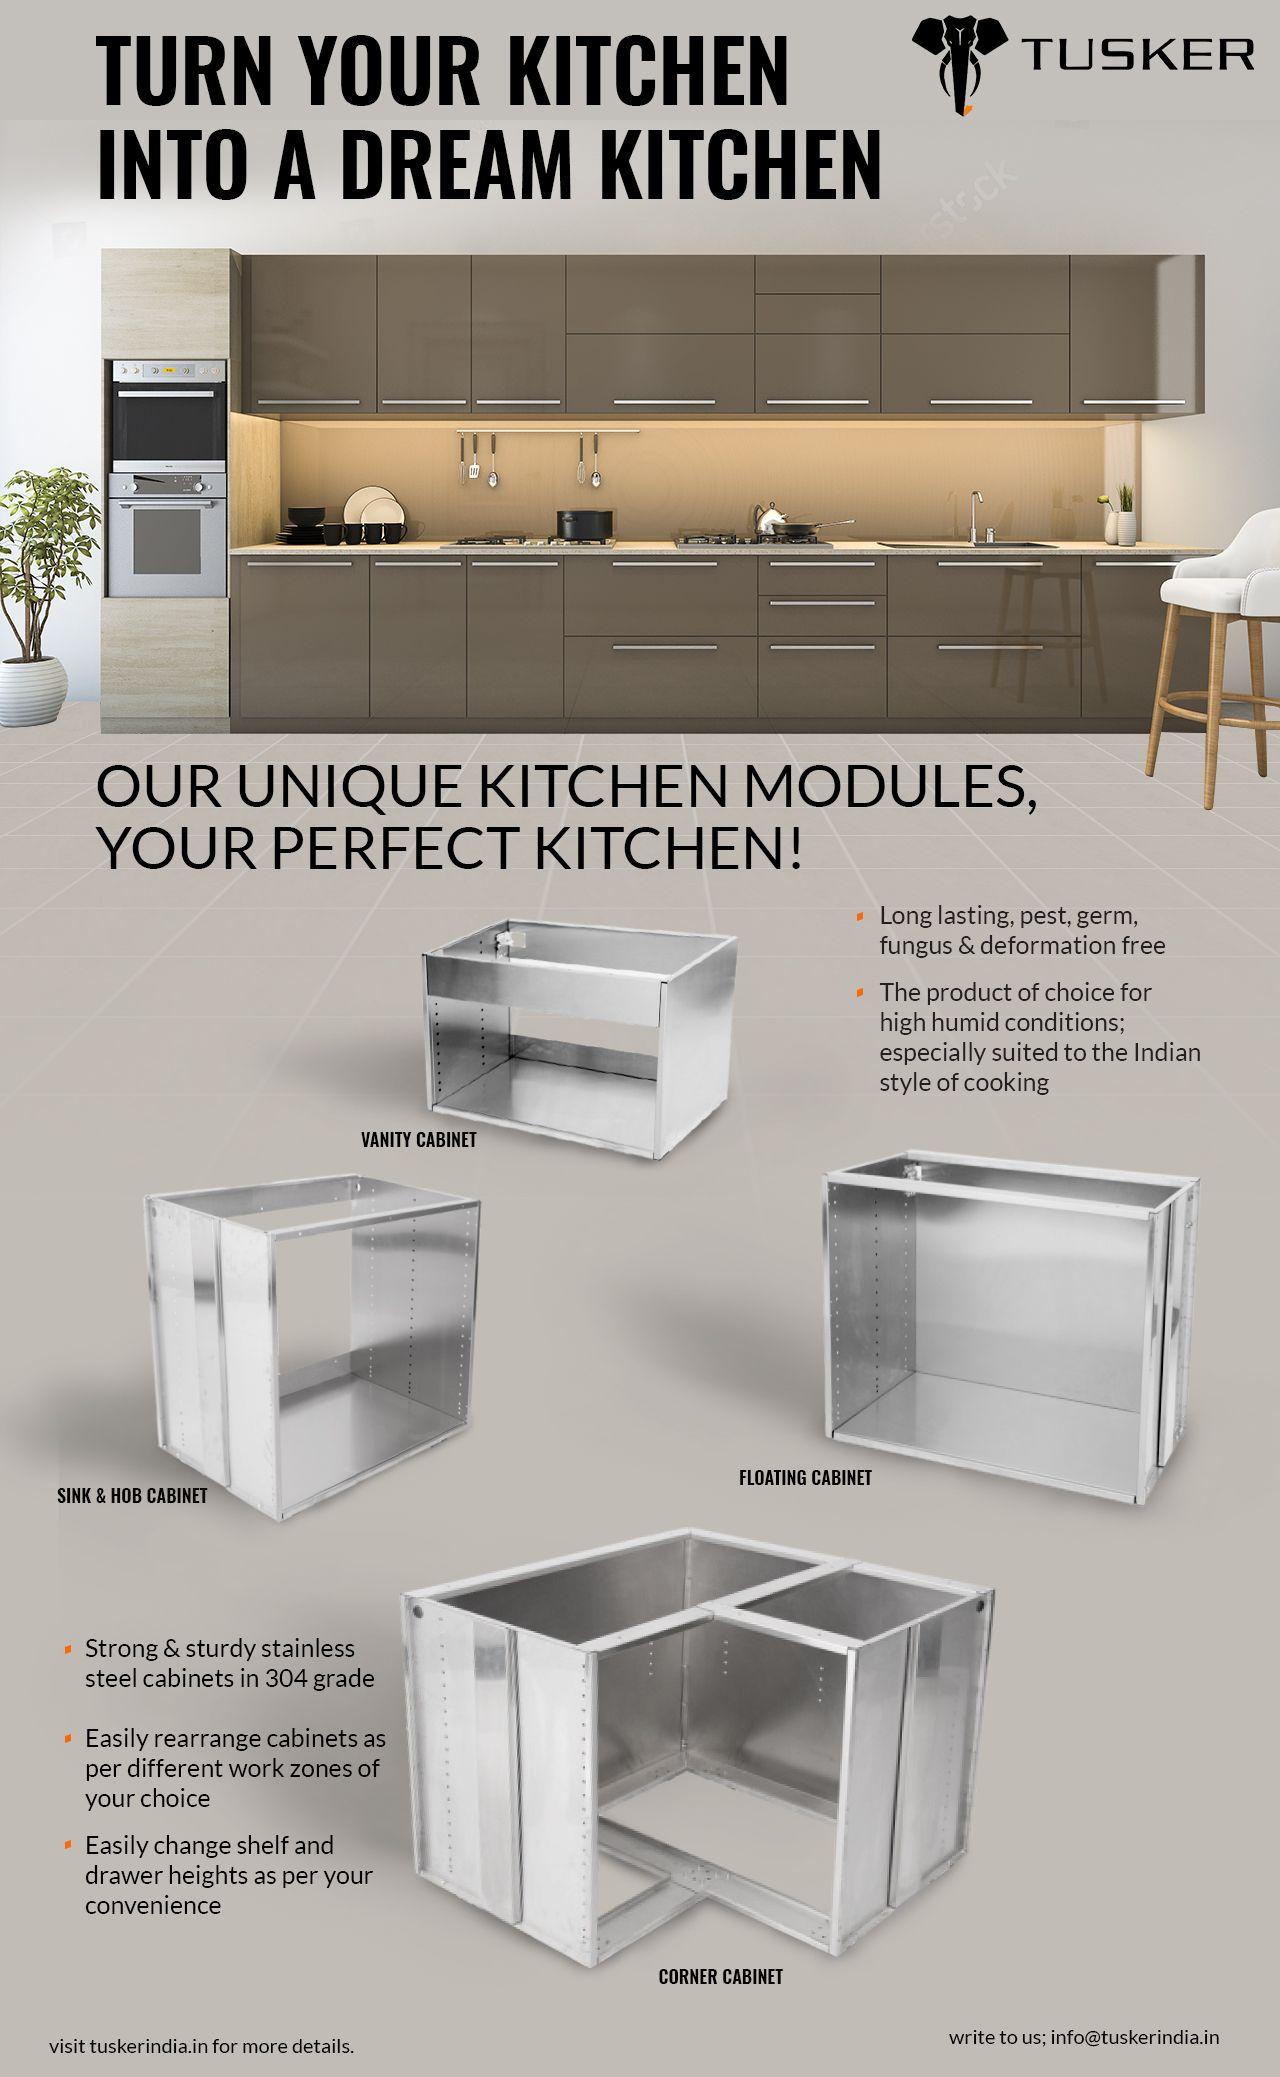 Turn Your Kitchen Into A Dream Kitchen Kitchen Kitchencabinet Stainlessste Stainless Steel Kitchen Cabinets Steel Kitchen Cabinets Kitchen Cabinets India